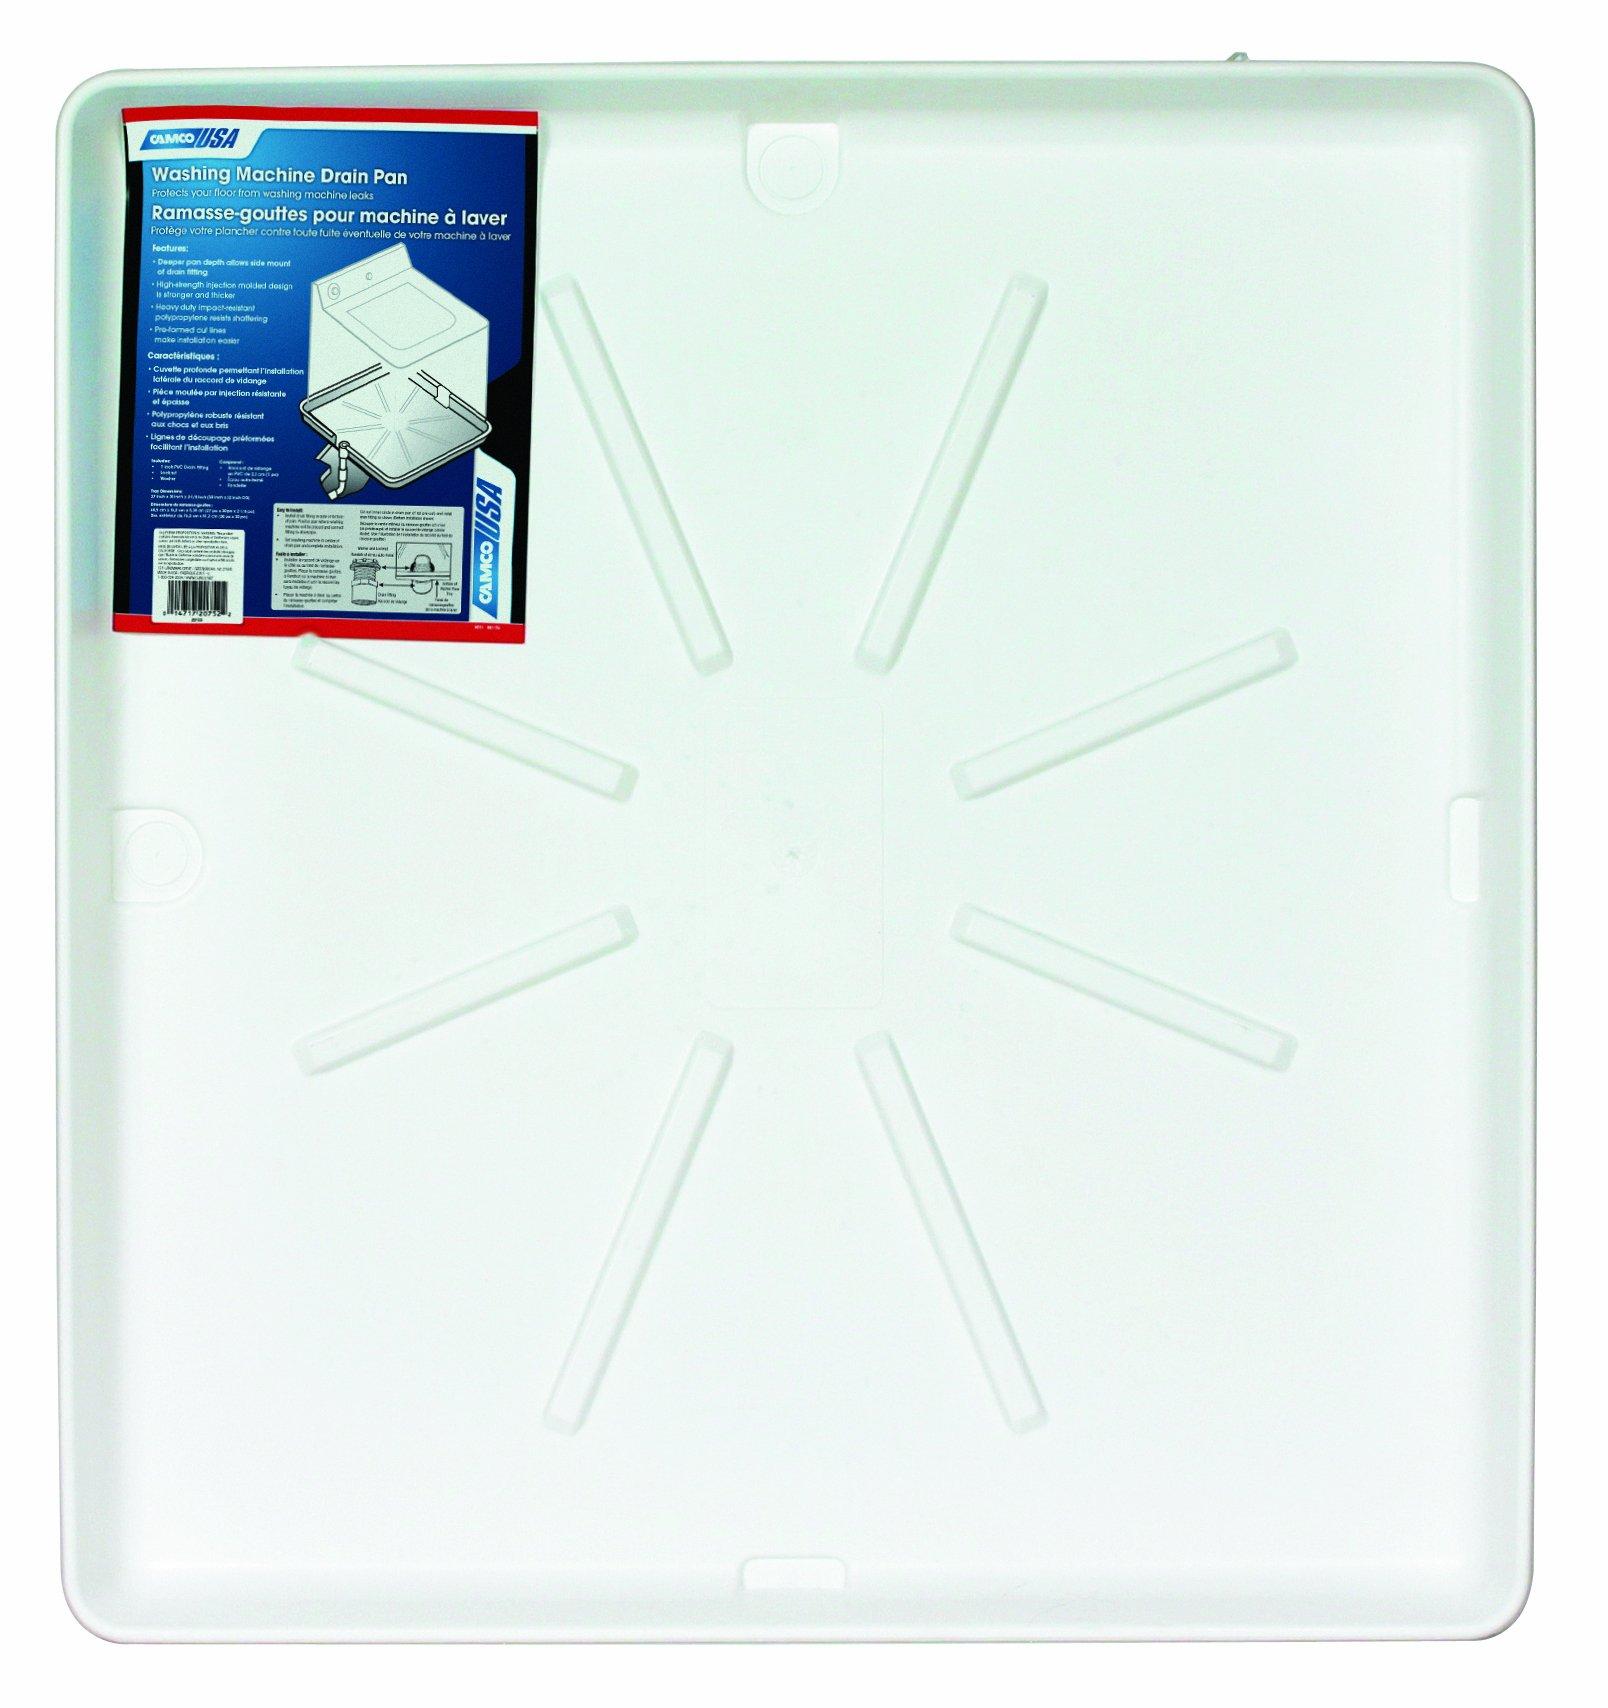 Camco 20756 32''OD x 30'' Washing Machine Drain Pan w/CPVC Fitting (White)